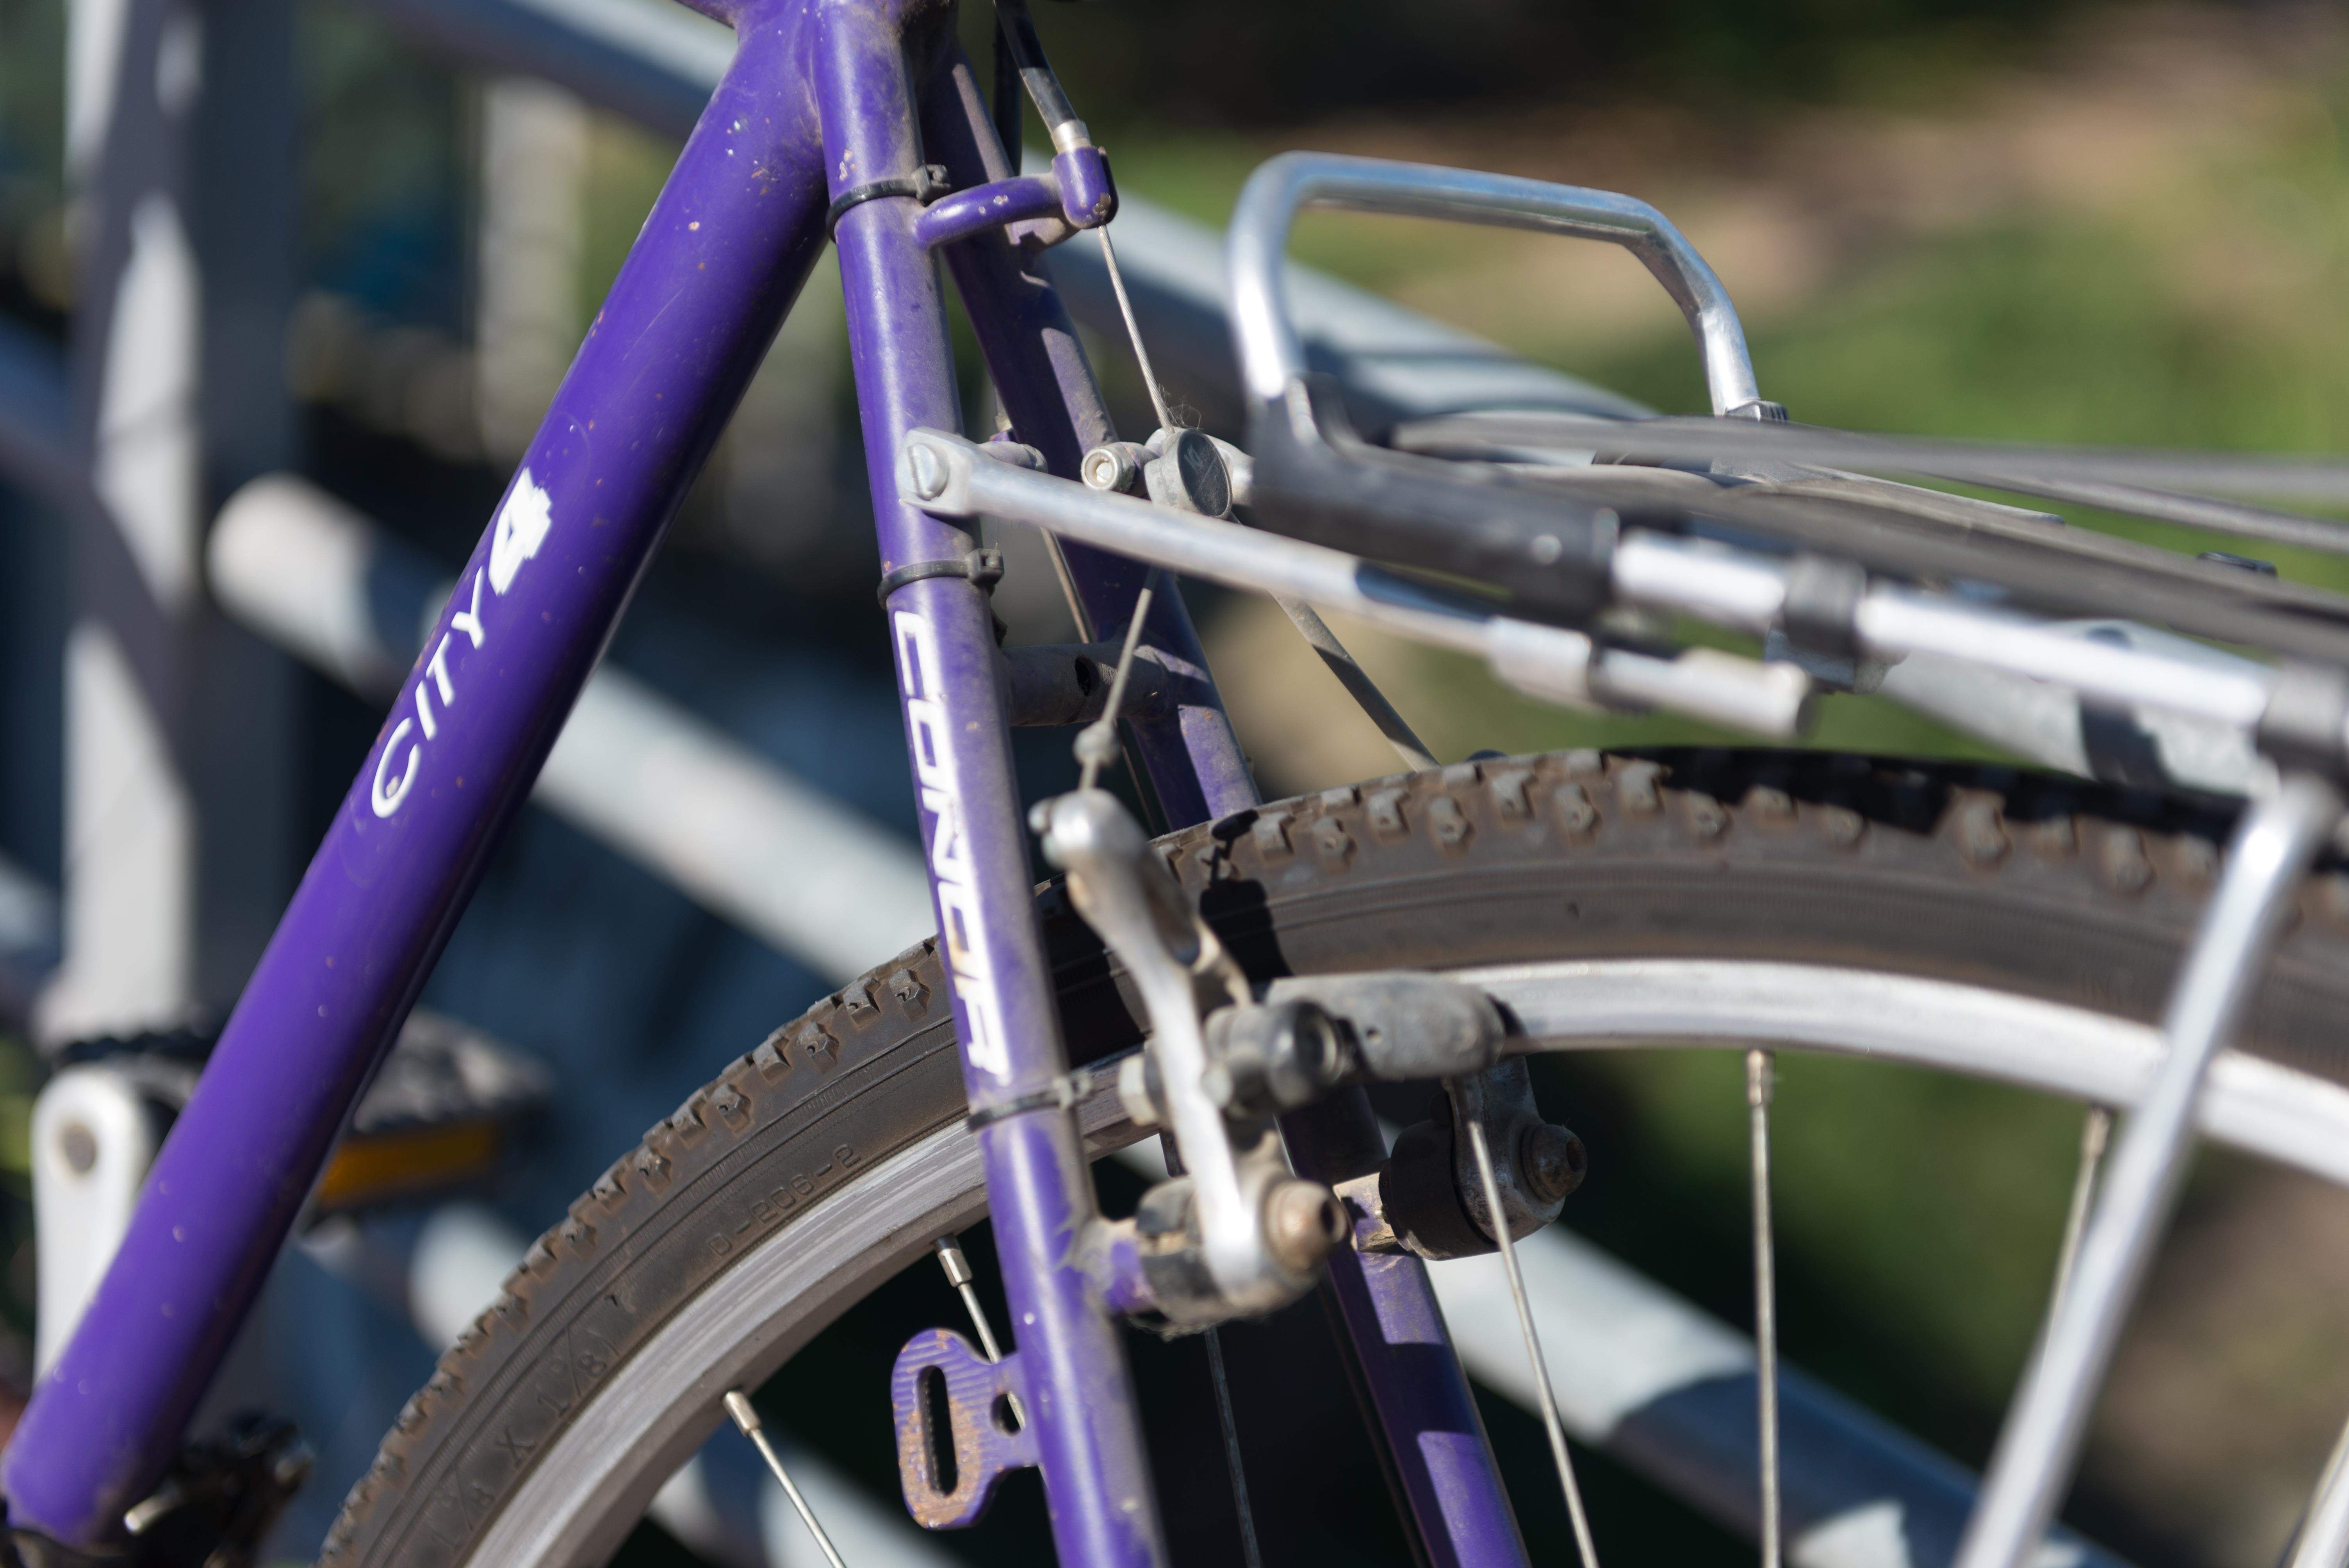 15-10-28-Conor bici-RalfR-WMA 3037.jpg